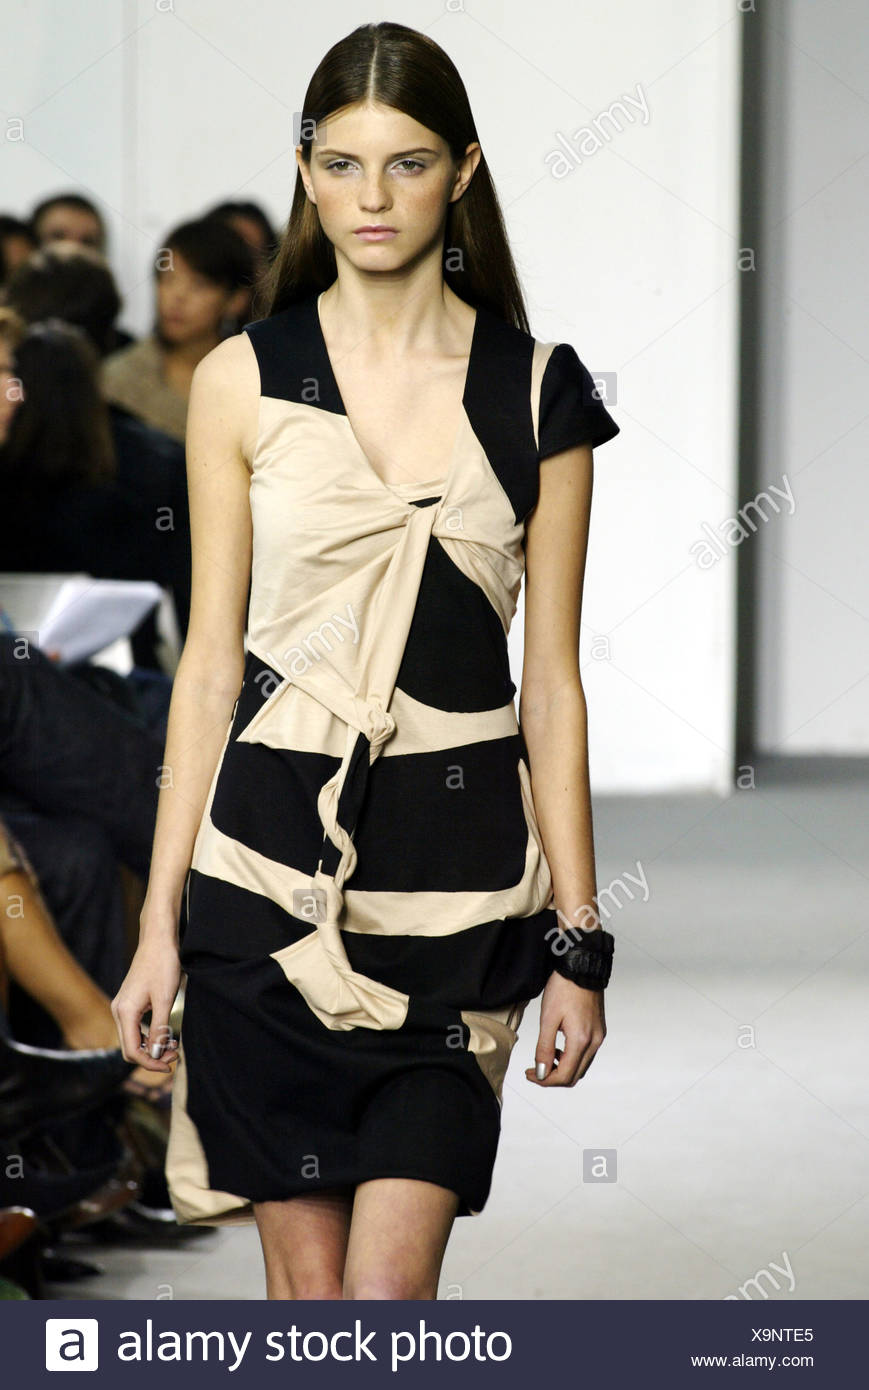 Helmut Lang Paris Ready to Wear Spring Summer Model long brunette hair tucked behind ears wearing black and beige asymmetric - Stock Image